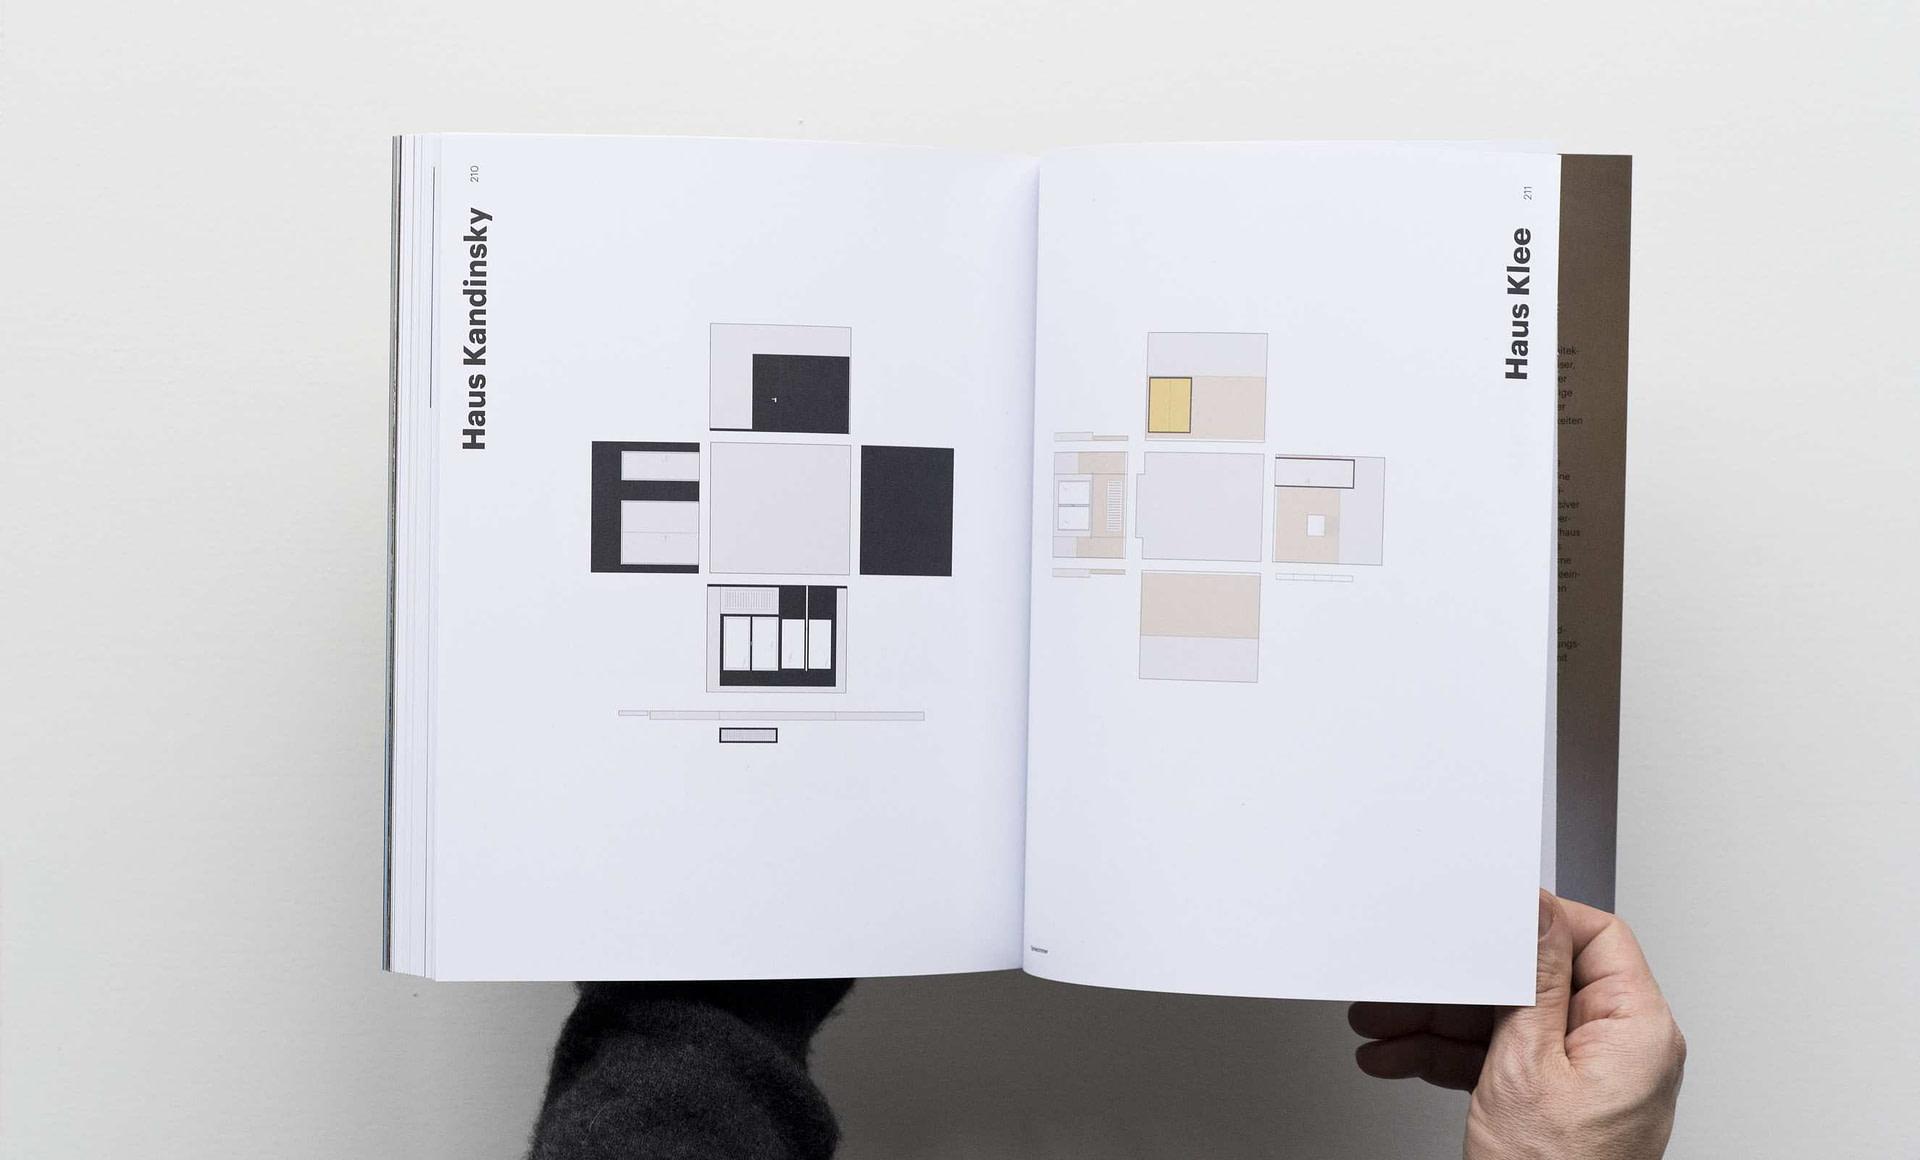 meisterhaus-kandinsky-klee-book-19-2650x1600px